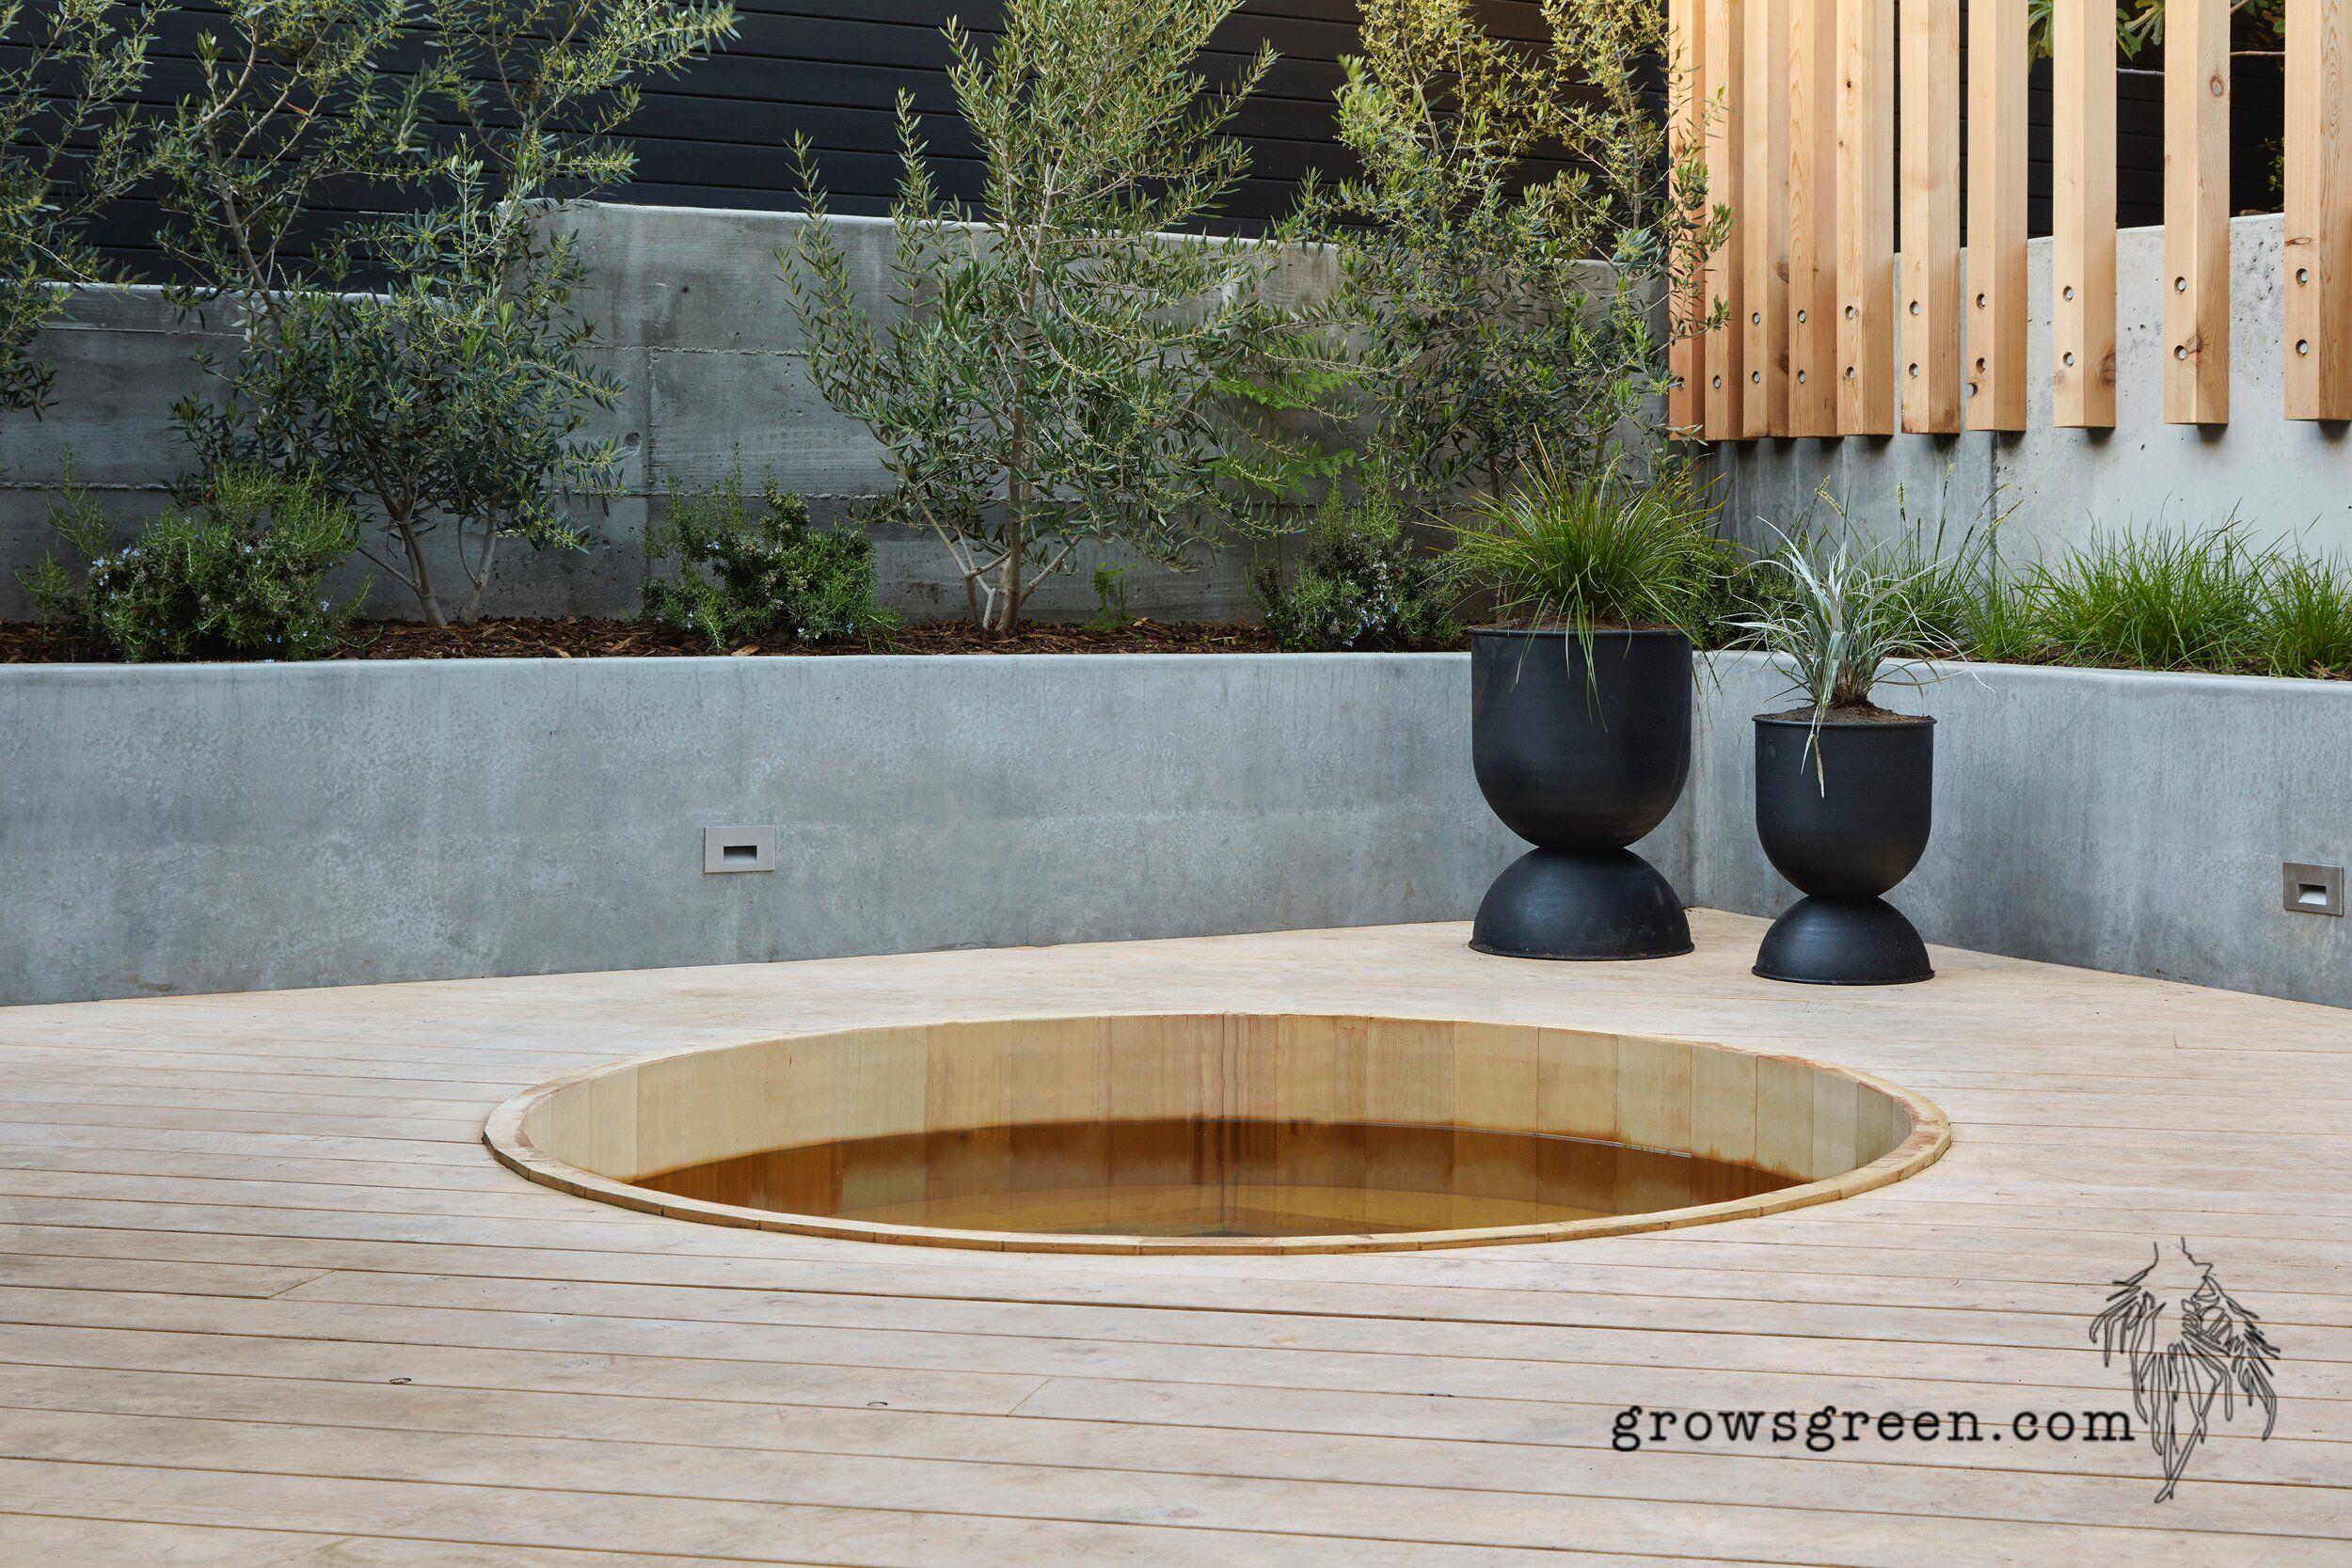 Photo of Apartment 34 Traditional Modern Garden — Growsgreen Landscape Design